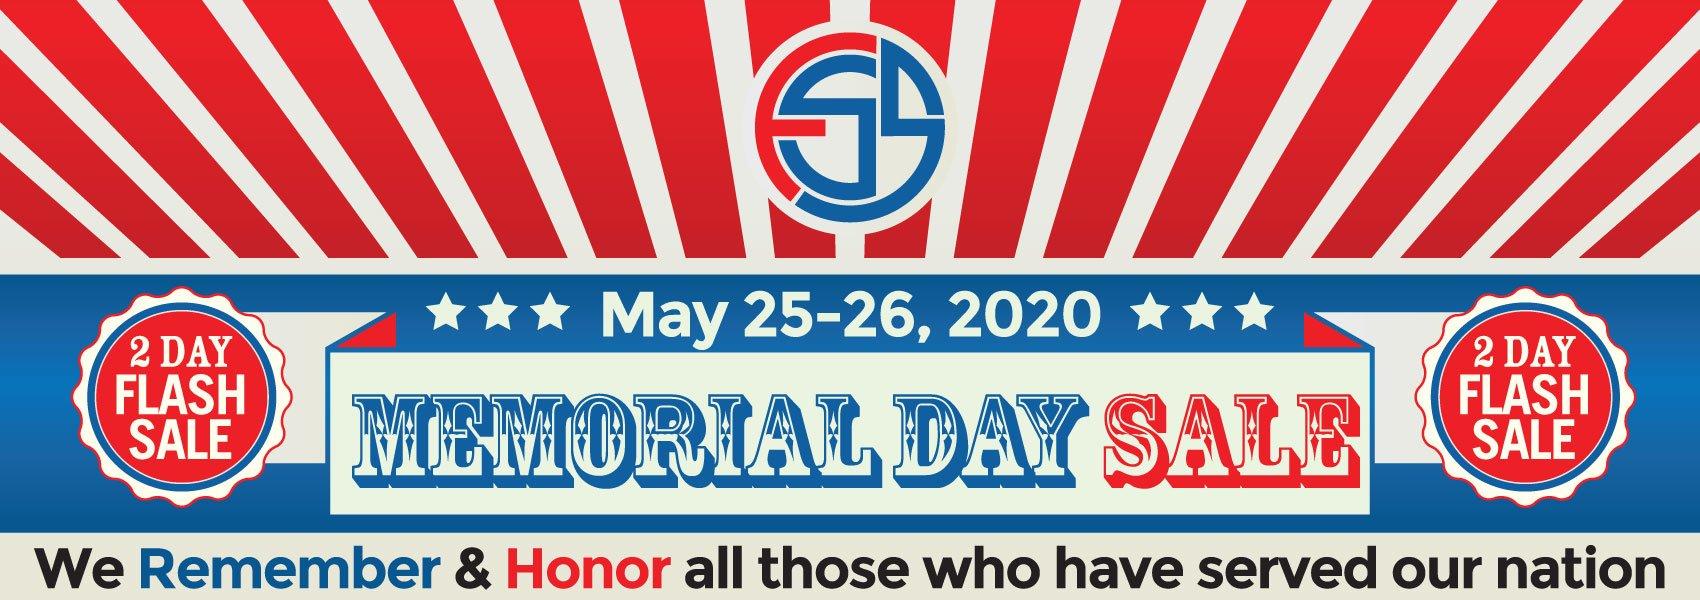 Memorial Day Sale May 25-26, 2020